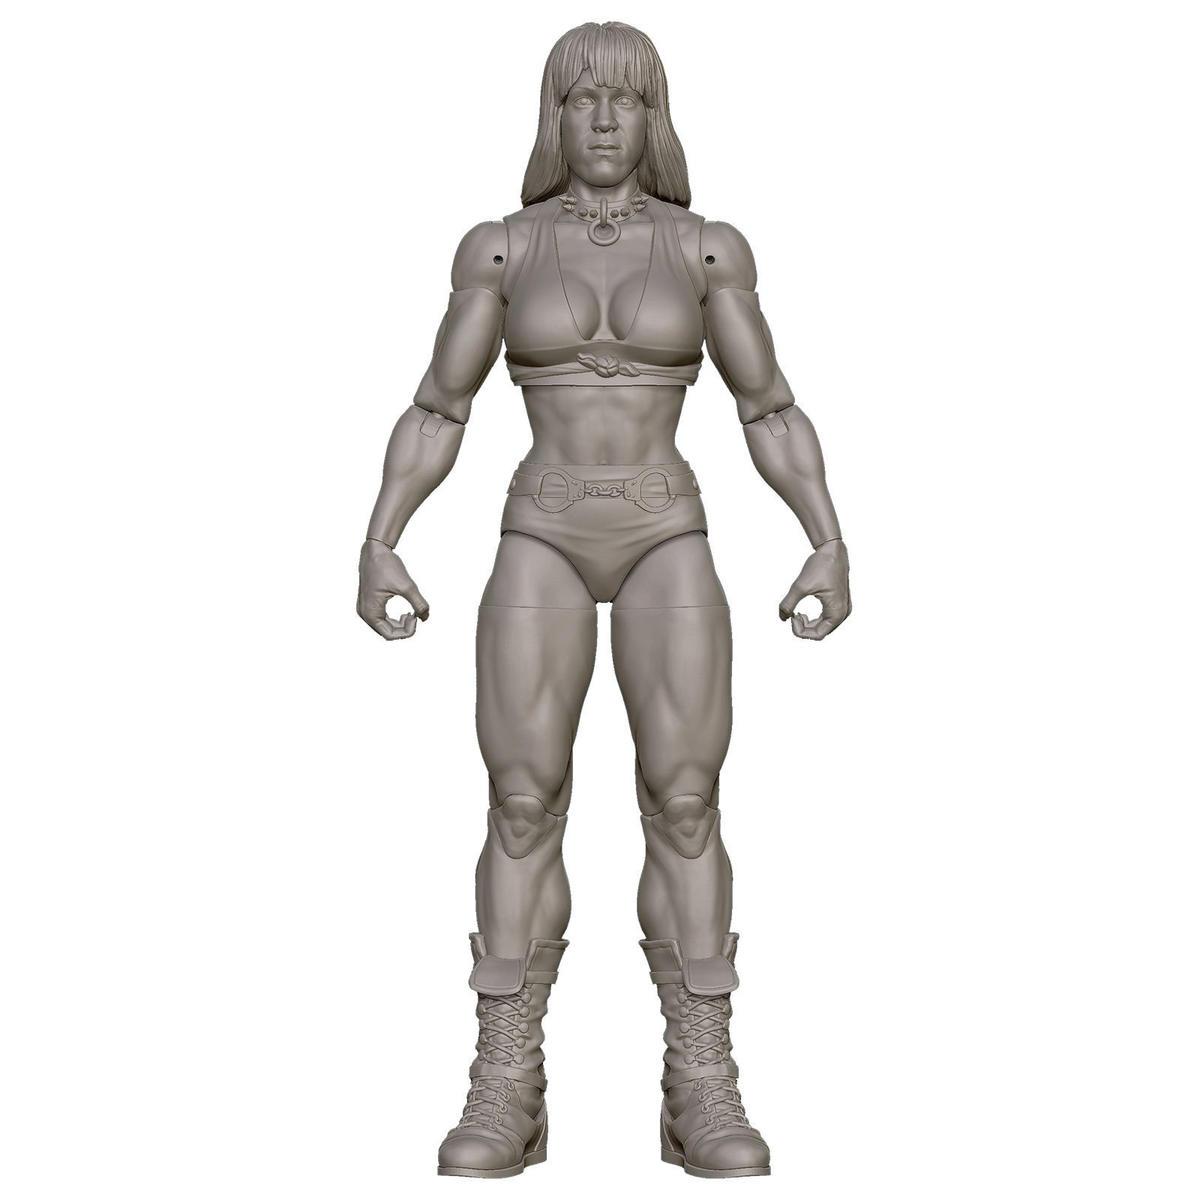 Mattel's San Diego Comic-Con International 2019 action figure